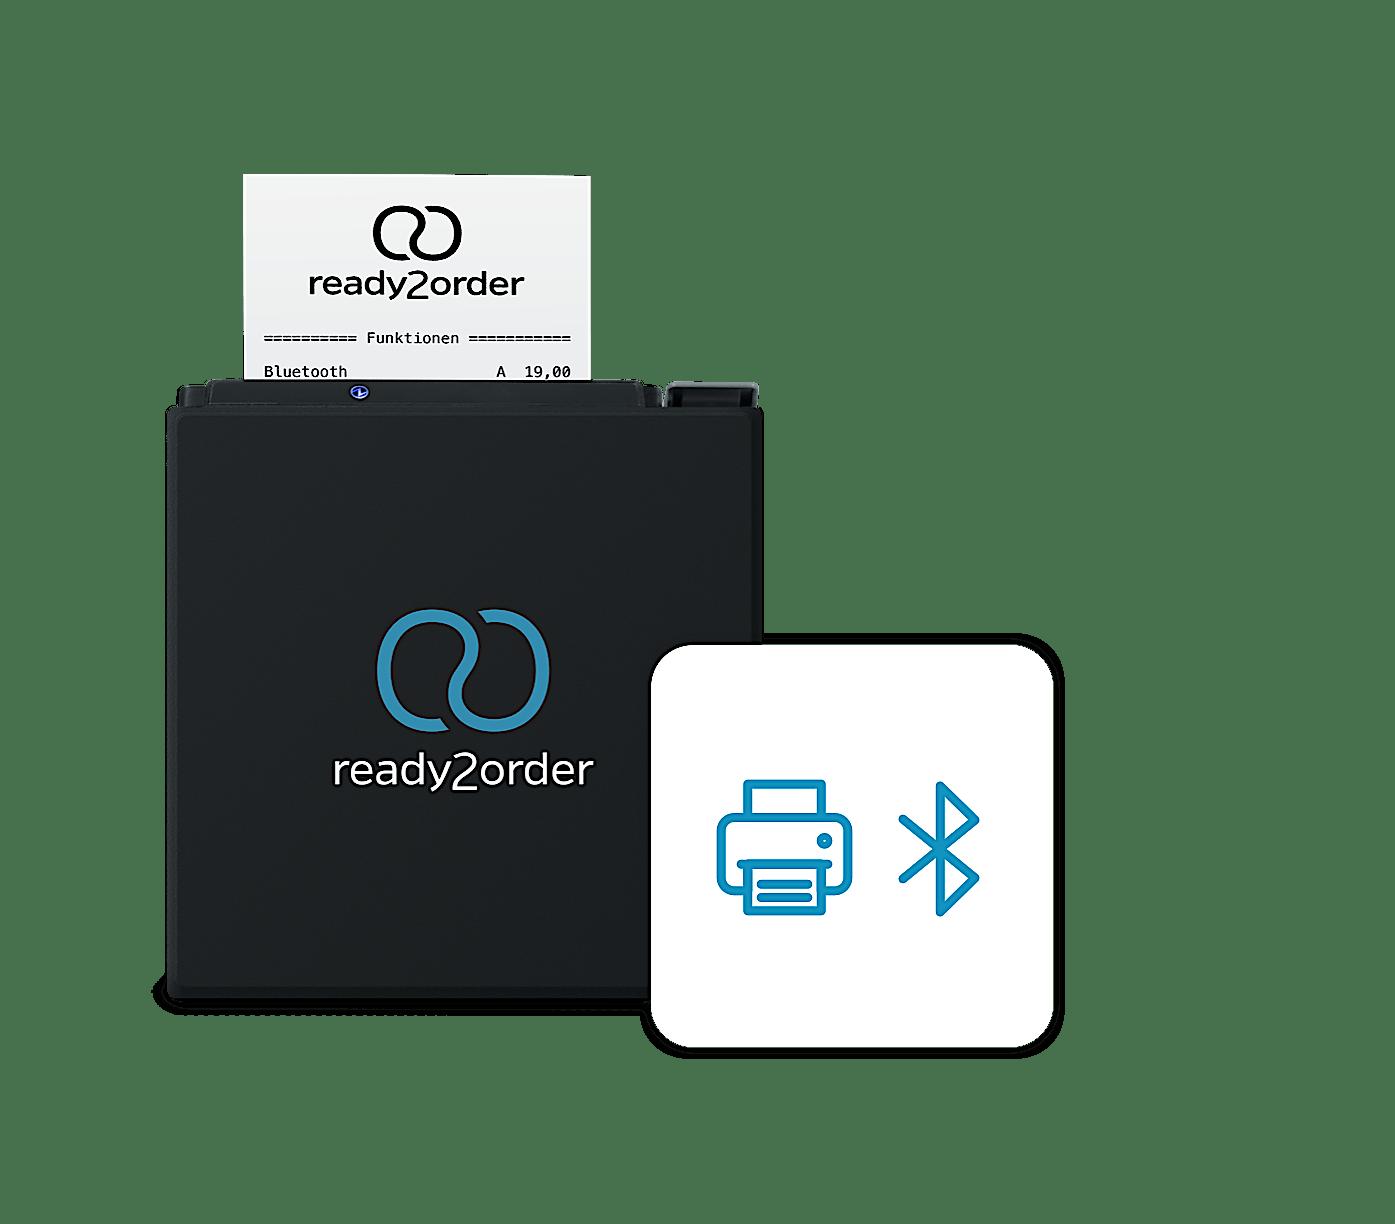 epson-printer.png